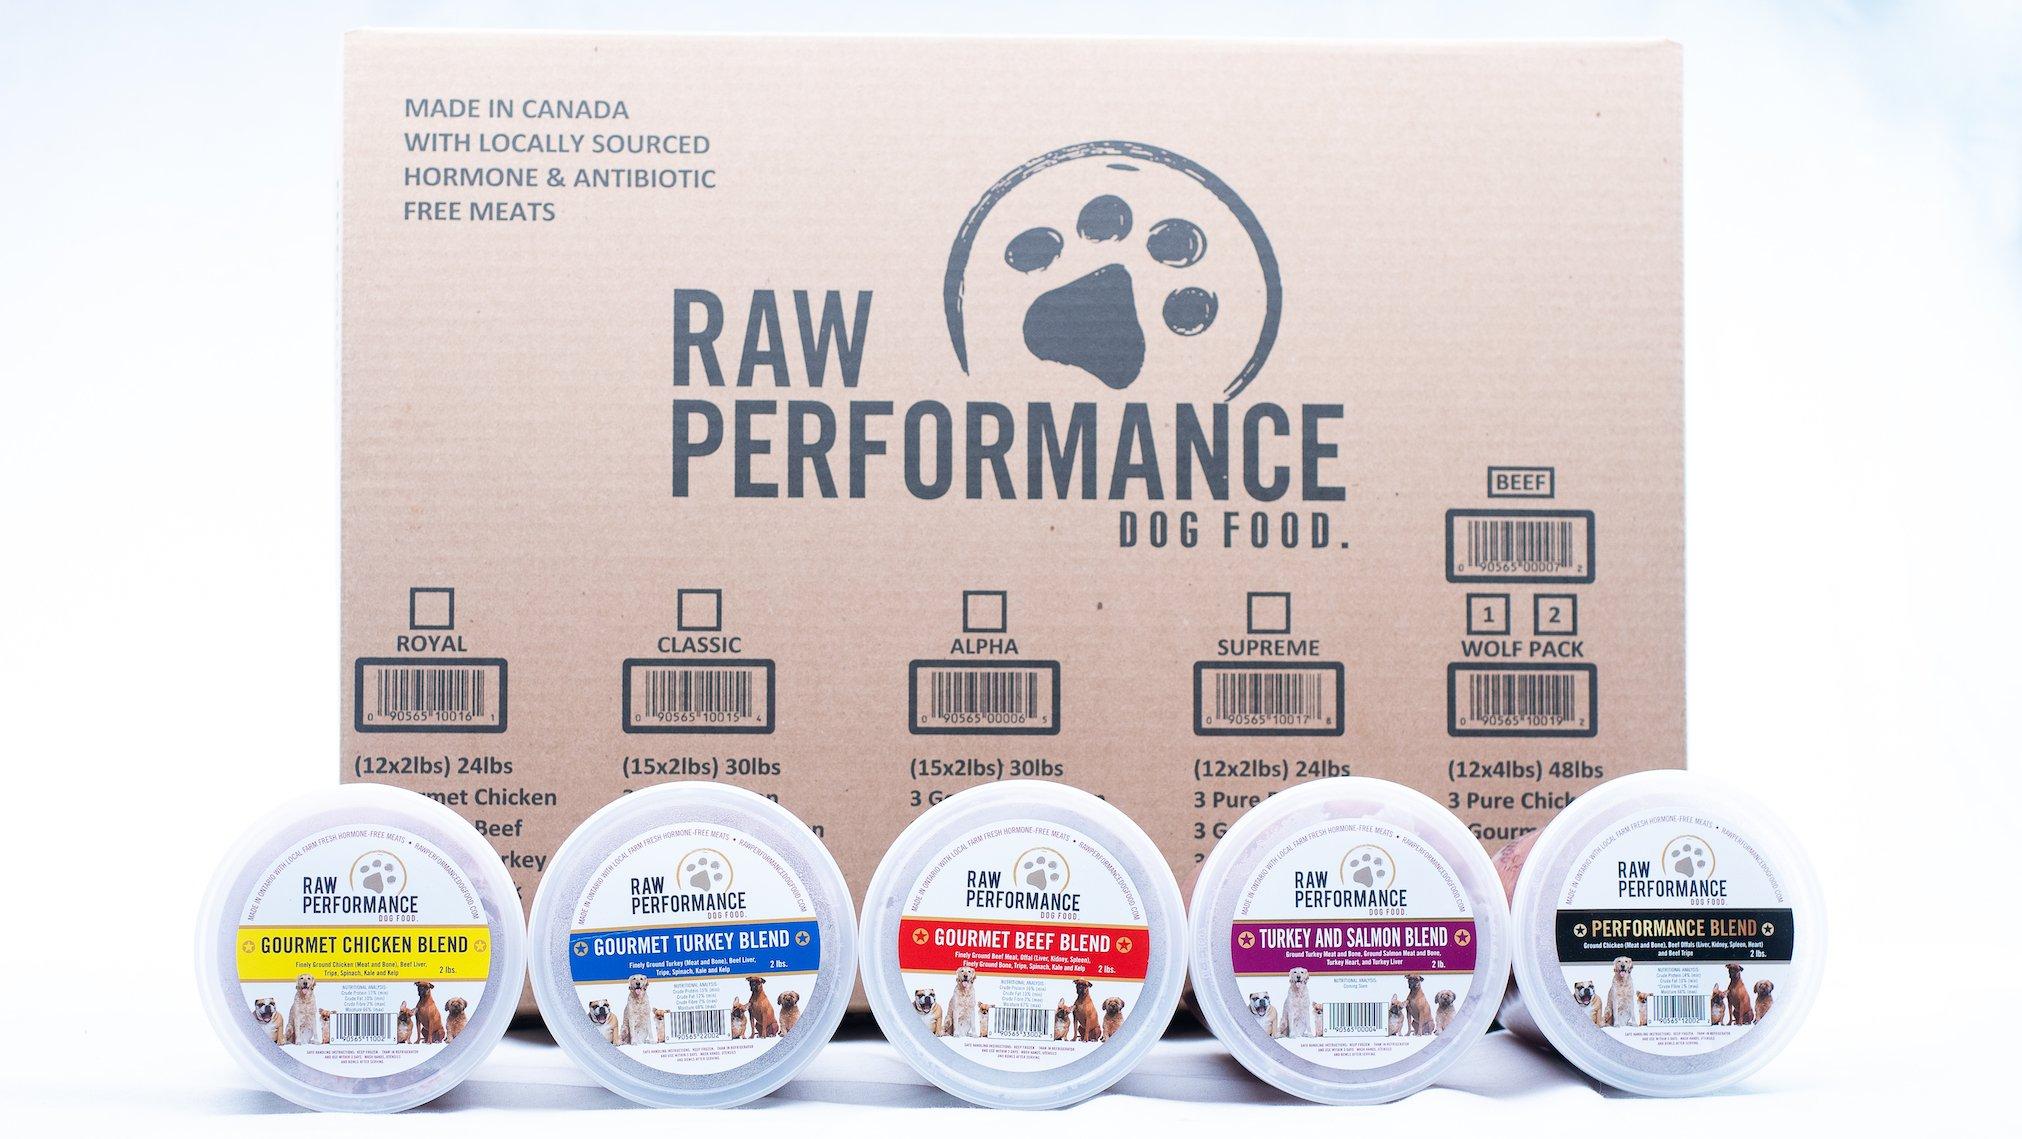 Raw Performance Variety Cases Alpha, 30-lbs (15 x 2-lbs) Dog Food